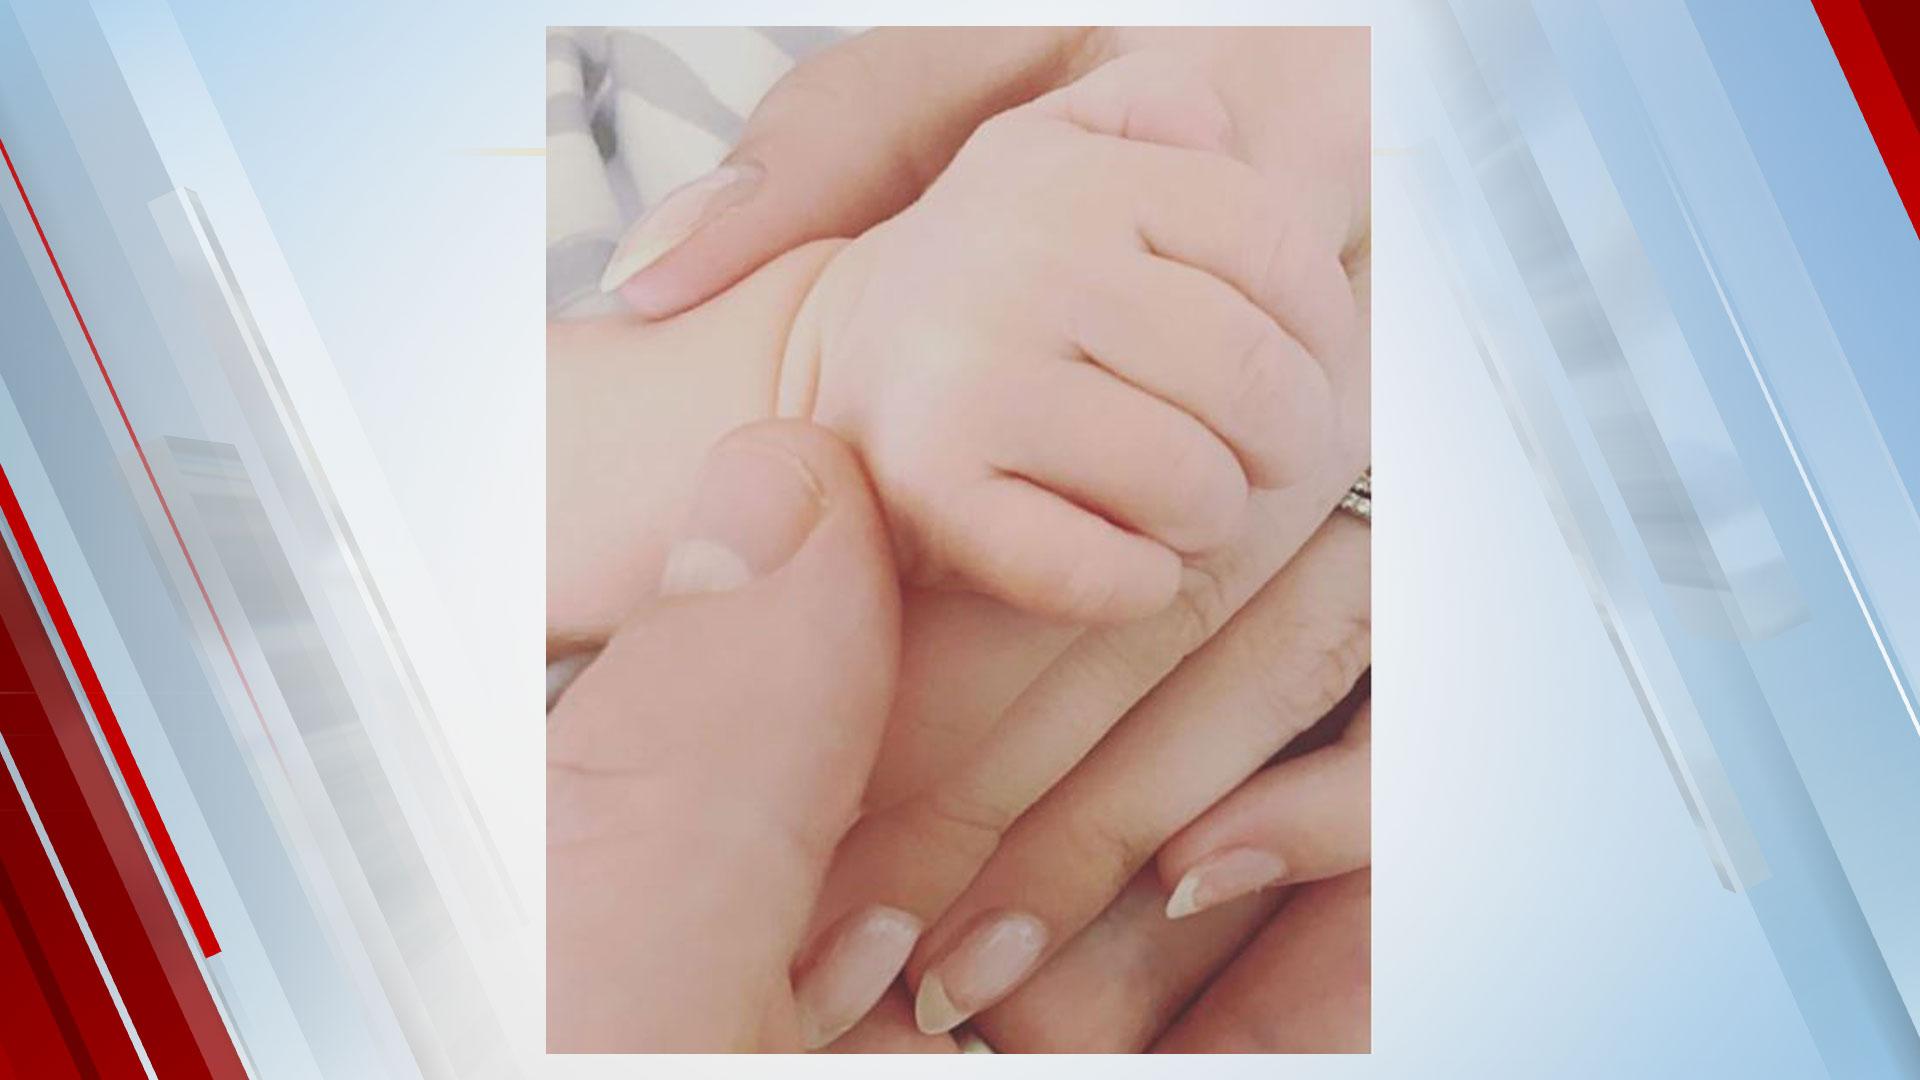 Chris Pratt, Katherine Schwarzenegger Announce Birth Of Daughter With Sweet Photo